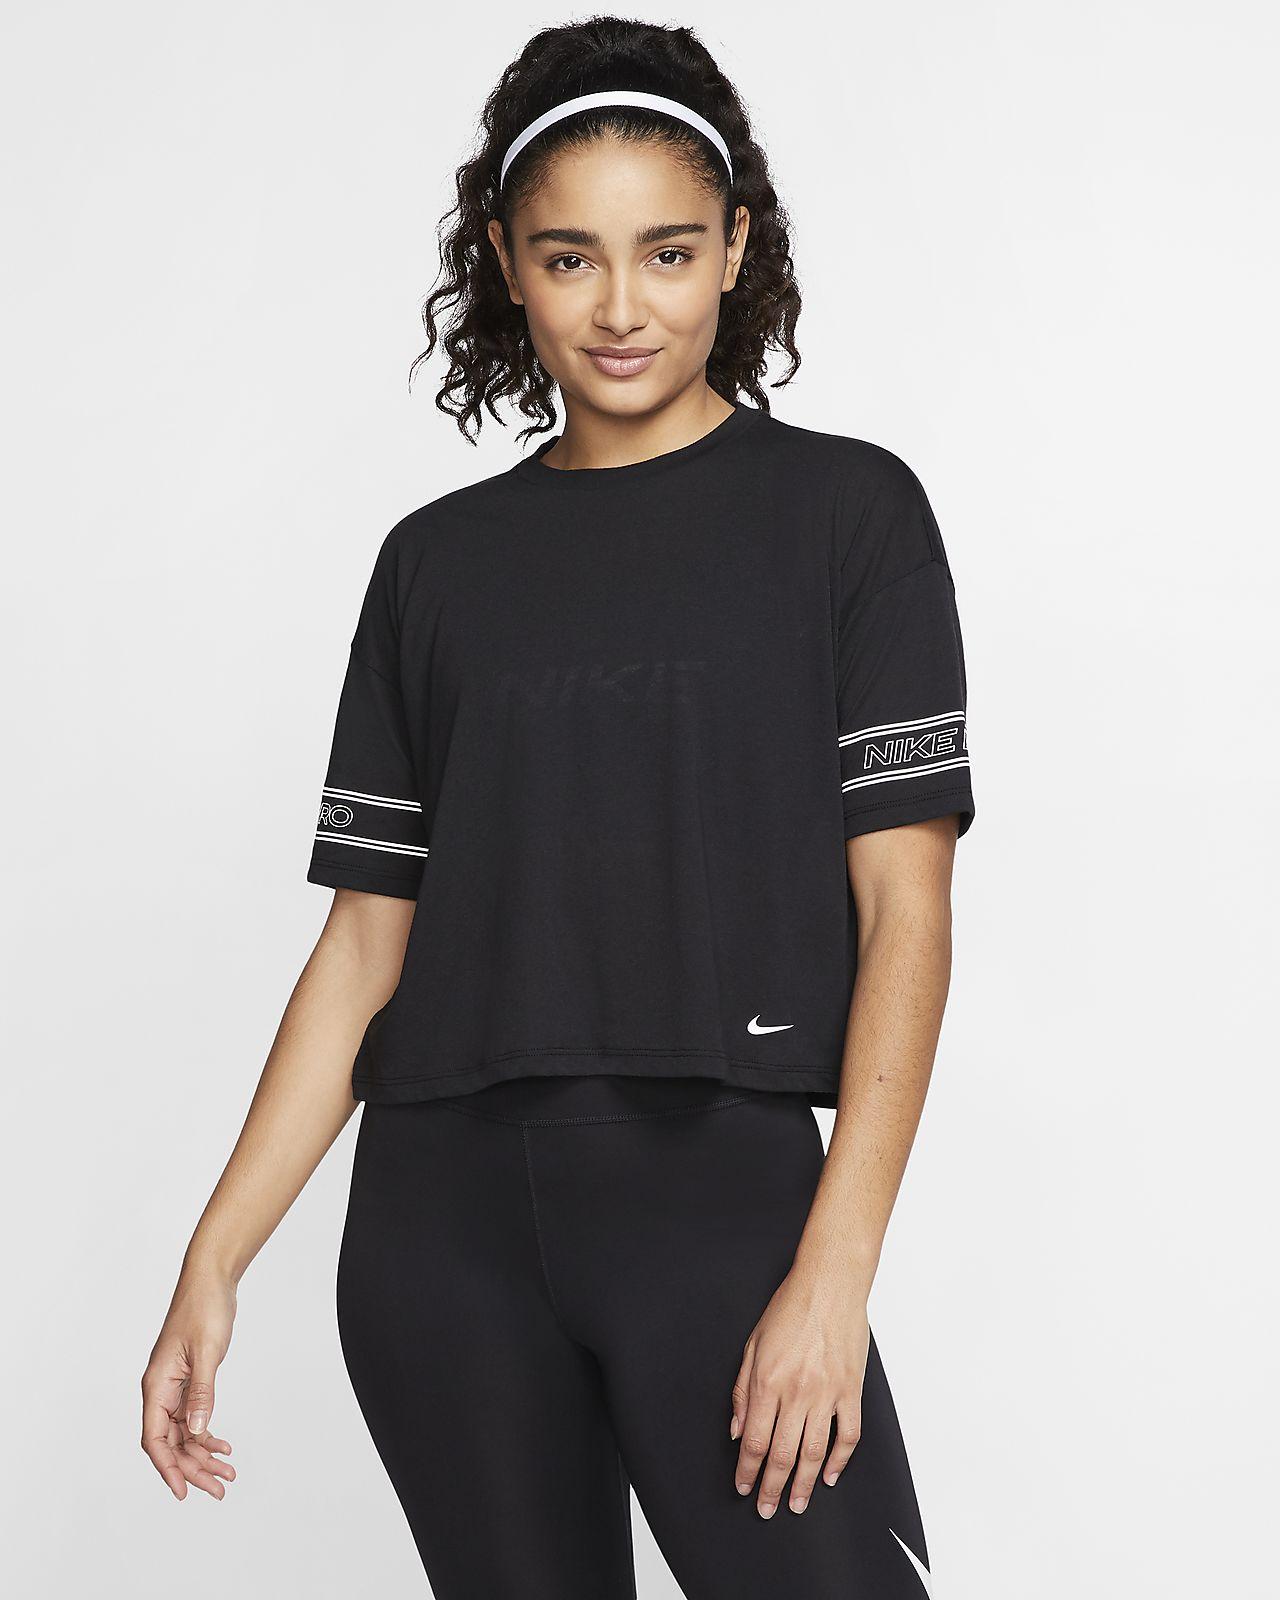 Женская футболка с коротким рукавом и графикой Nike Pro